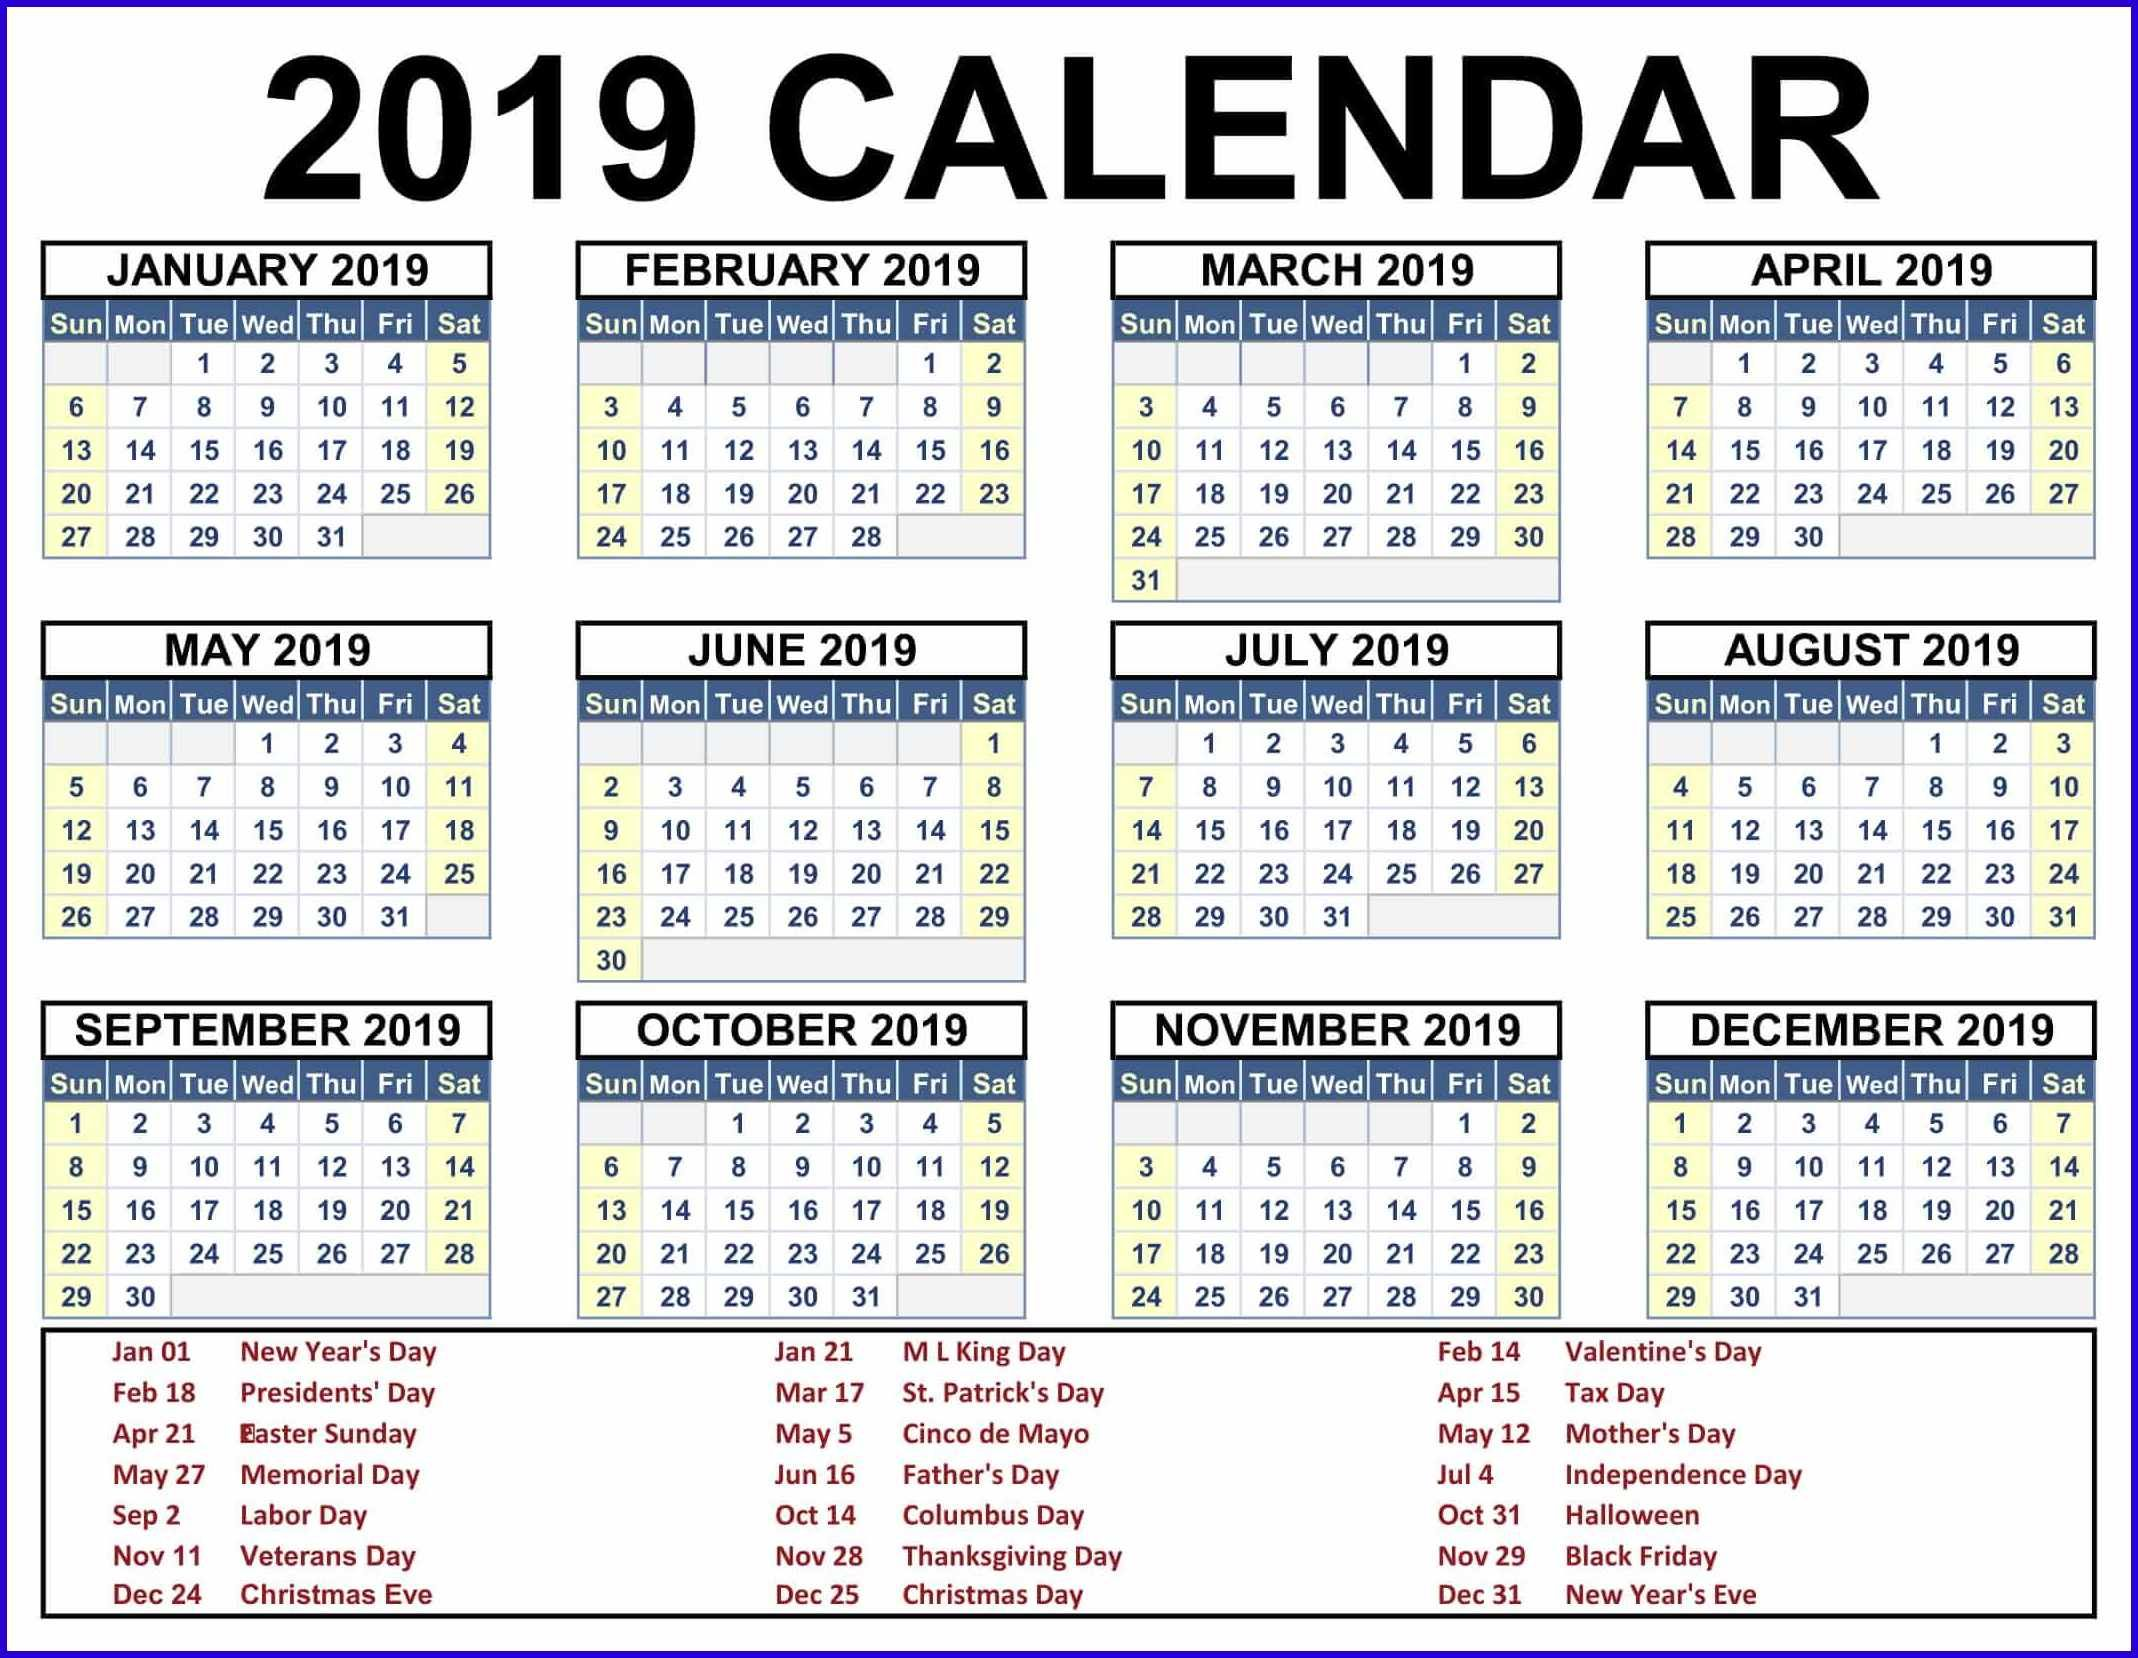 Wedding decorations for house january 2019 Printable Calendar  With Holidays calendar